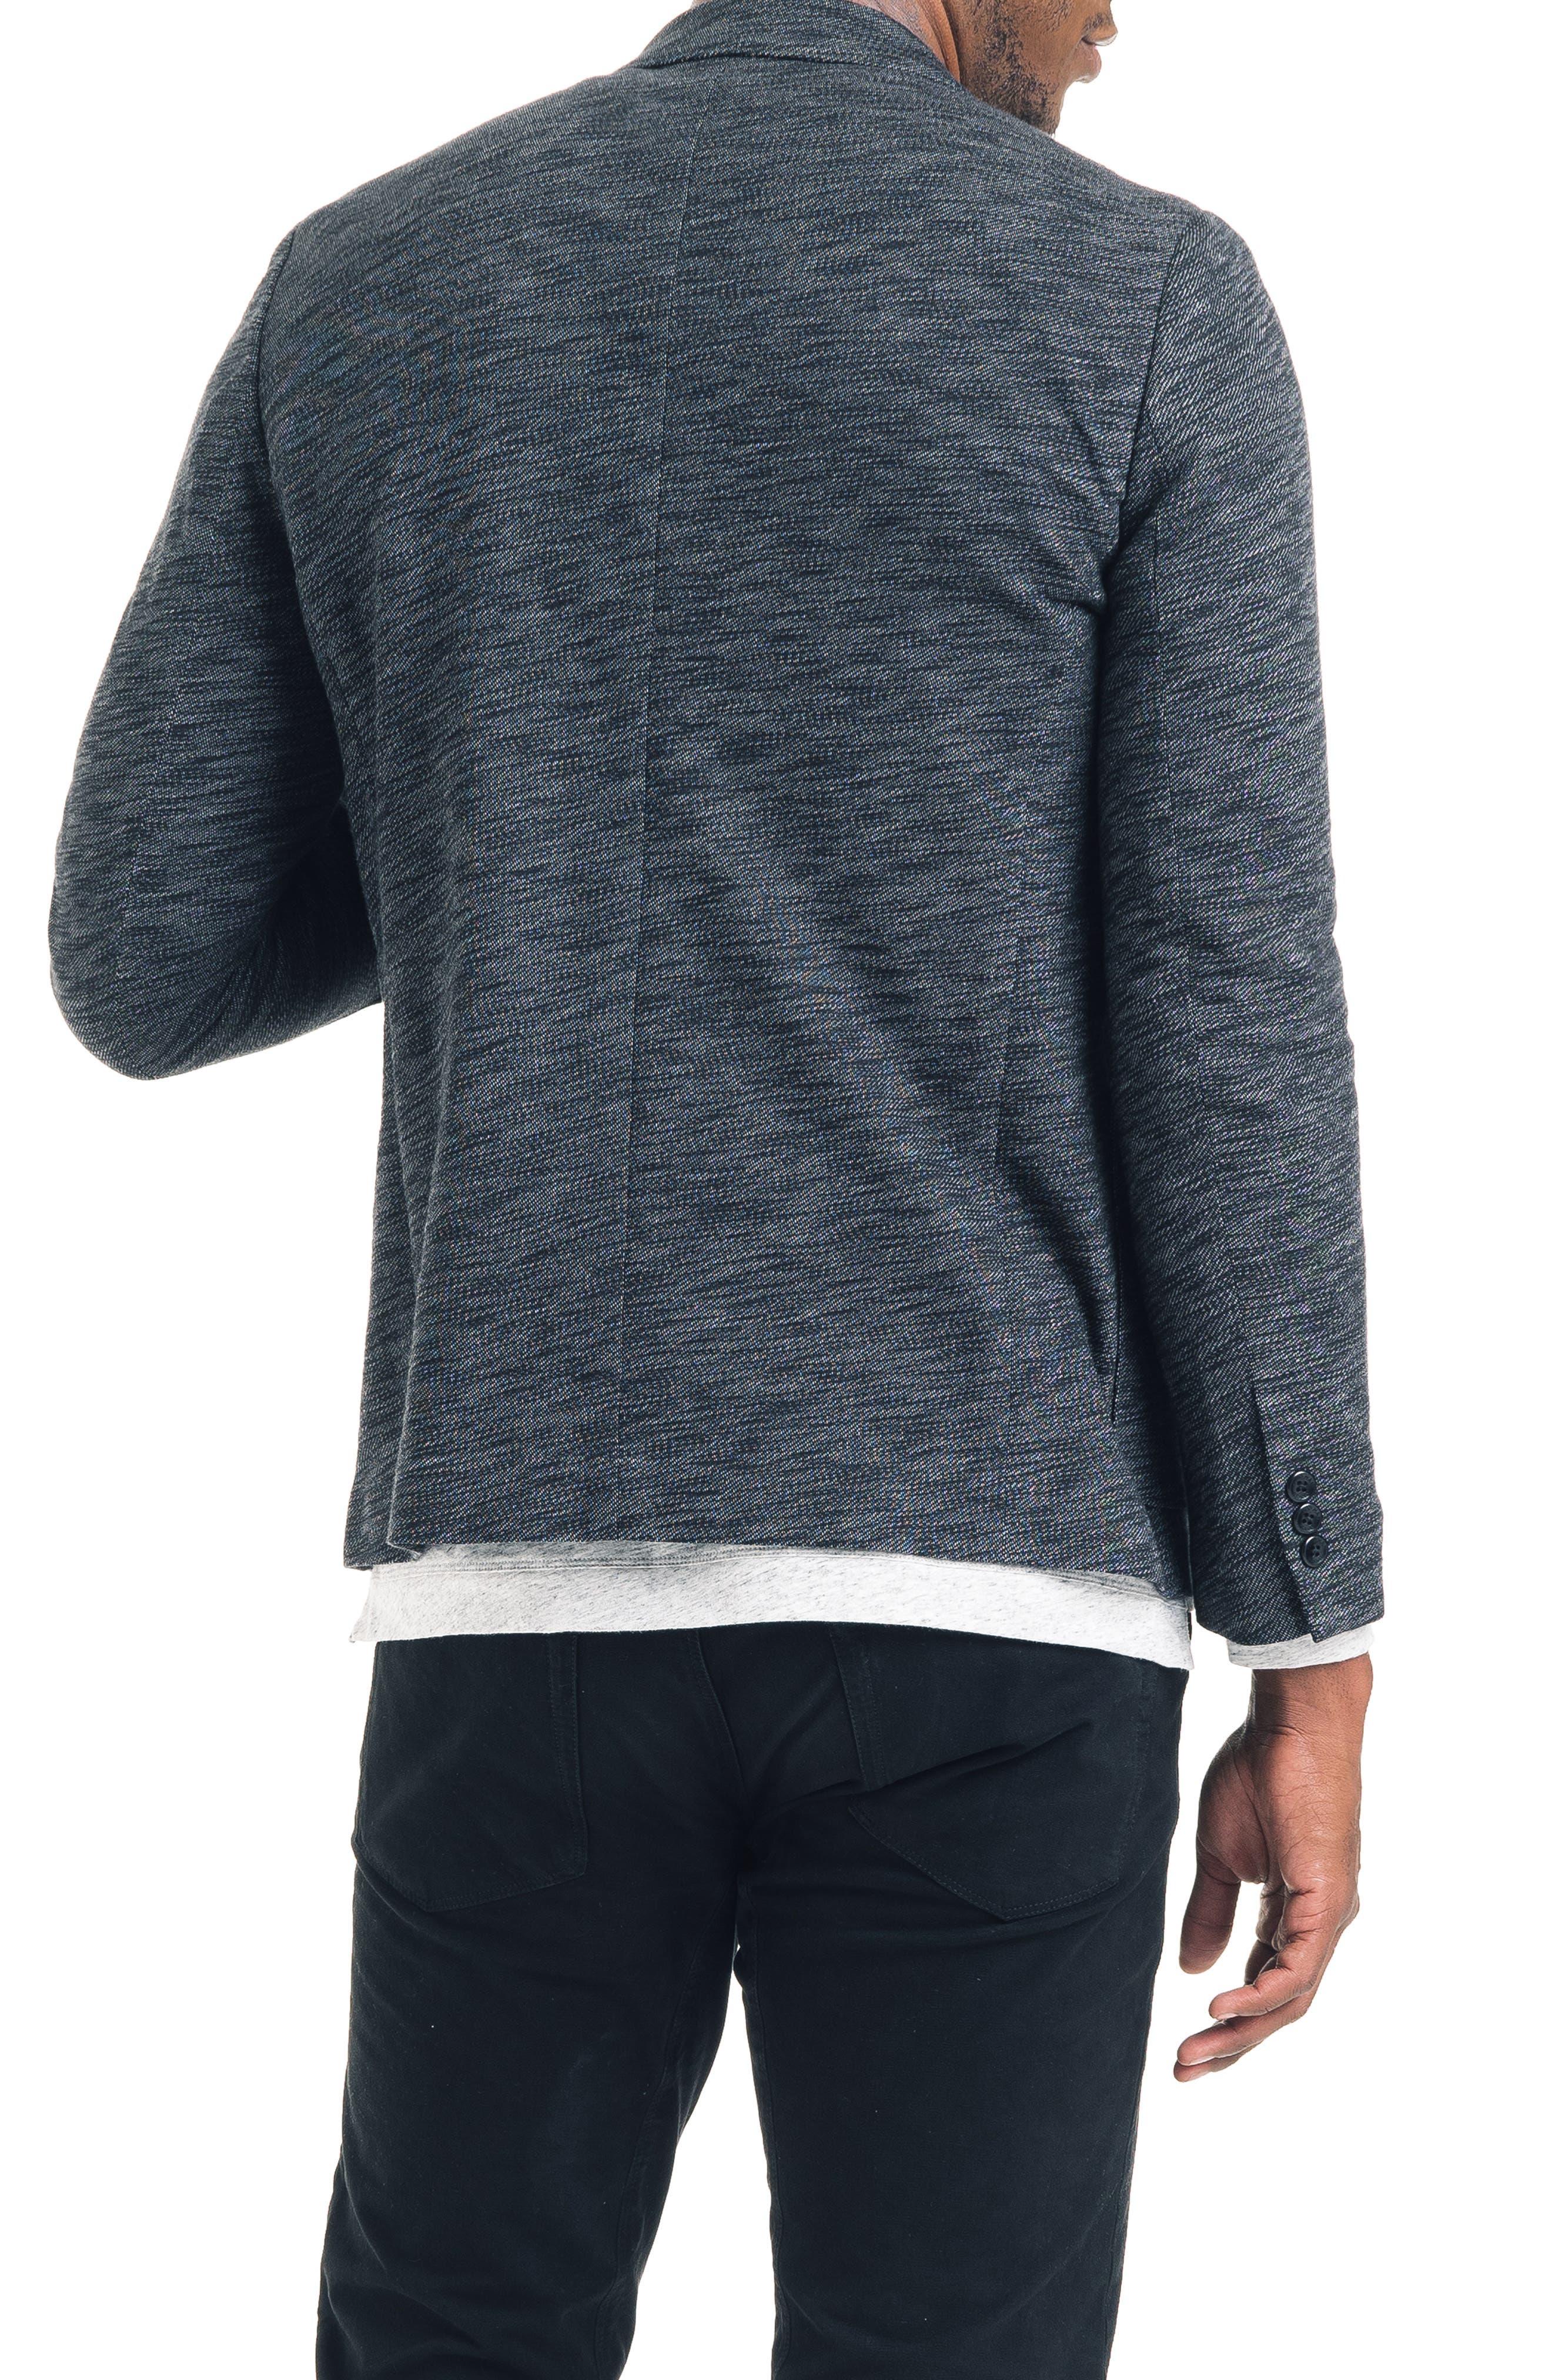 Slim Fit Vintage Twill Knit Sport Coat,                             Alternate thumbnail 2, color,                             BLACK / GREY HEATHER